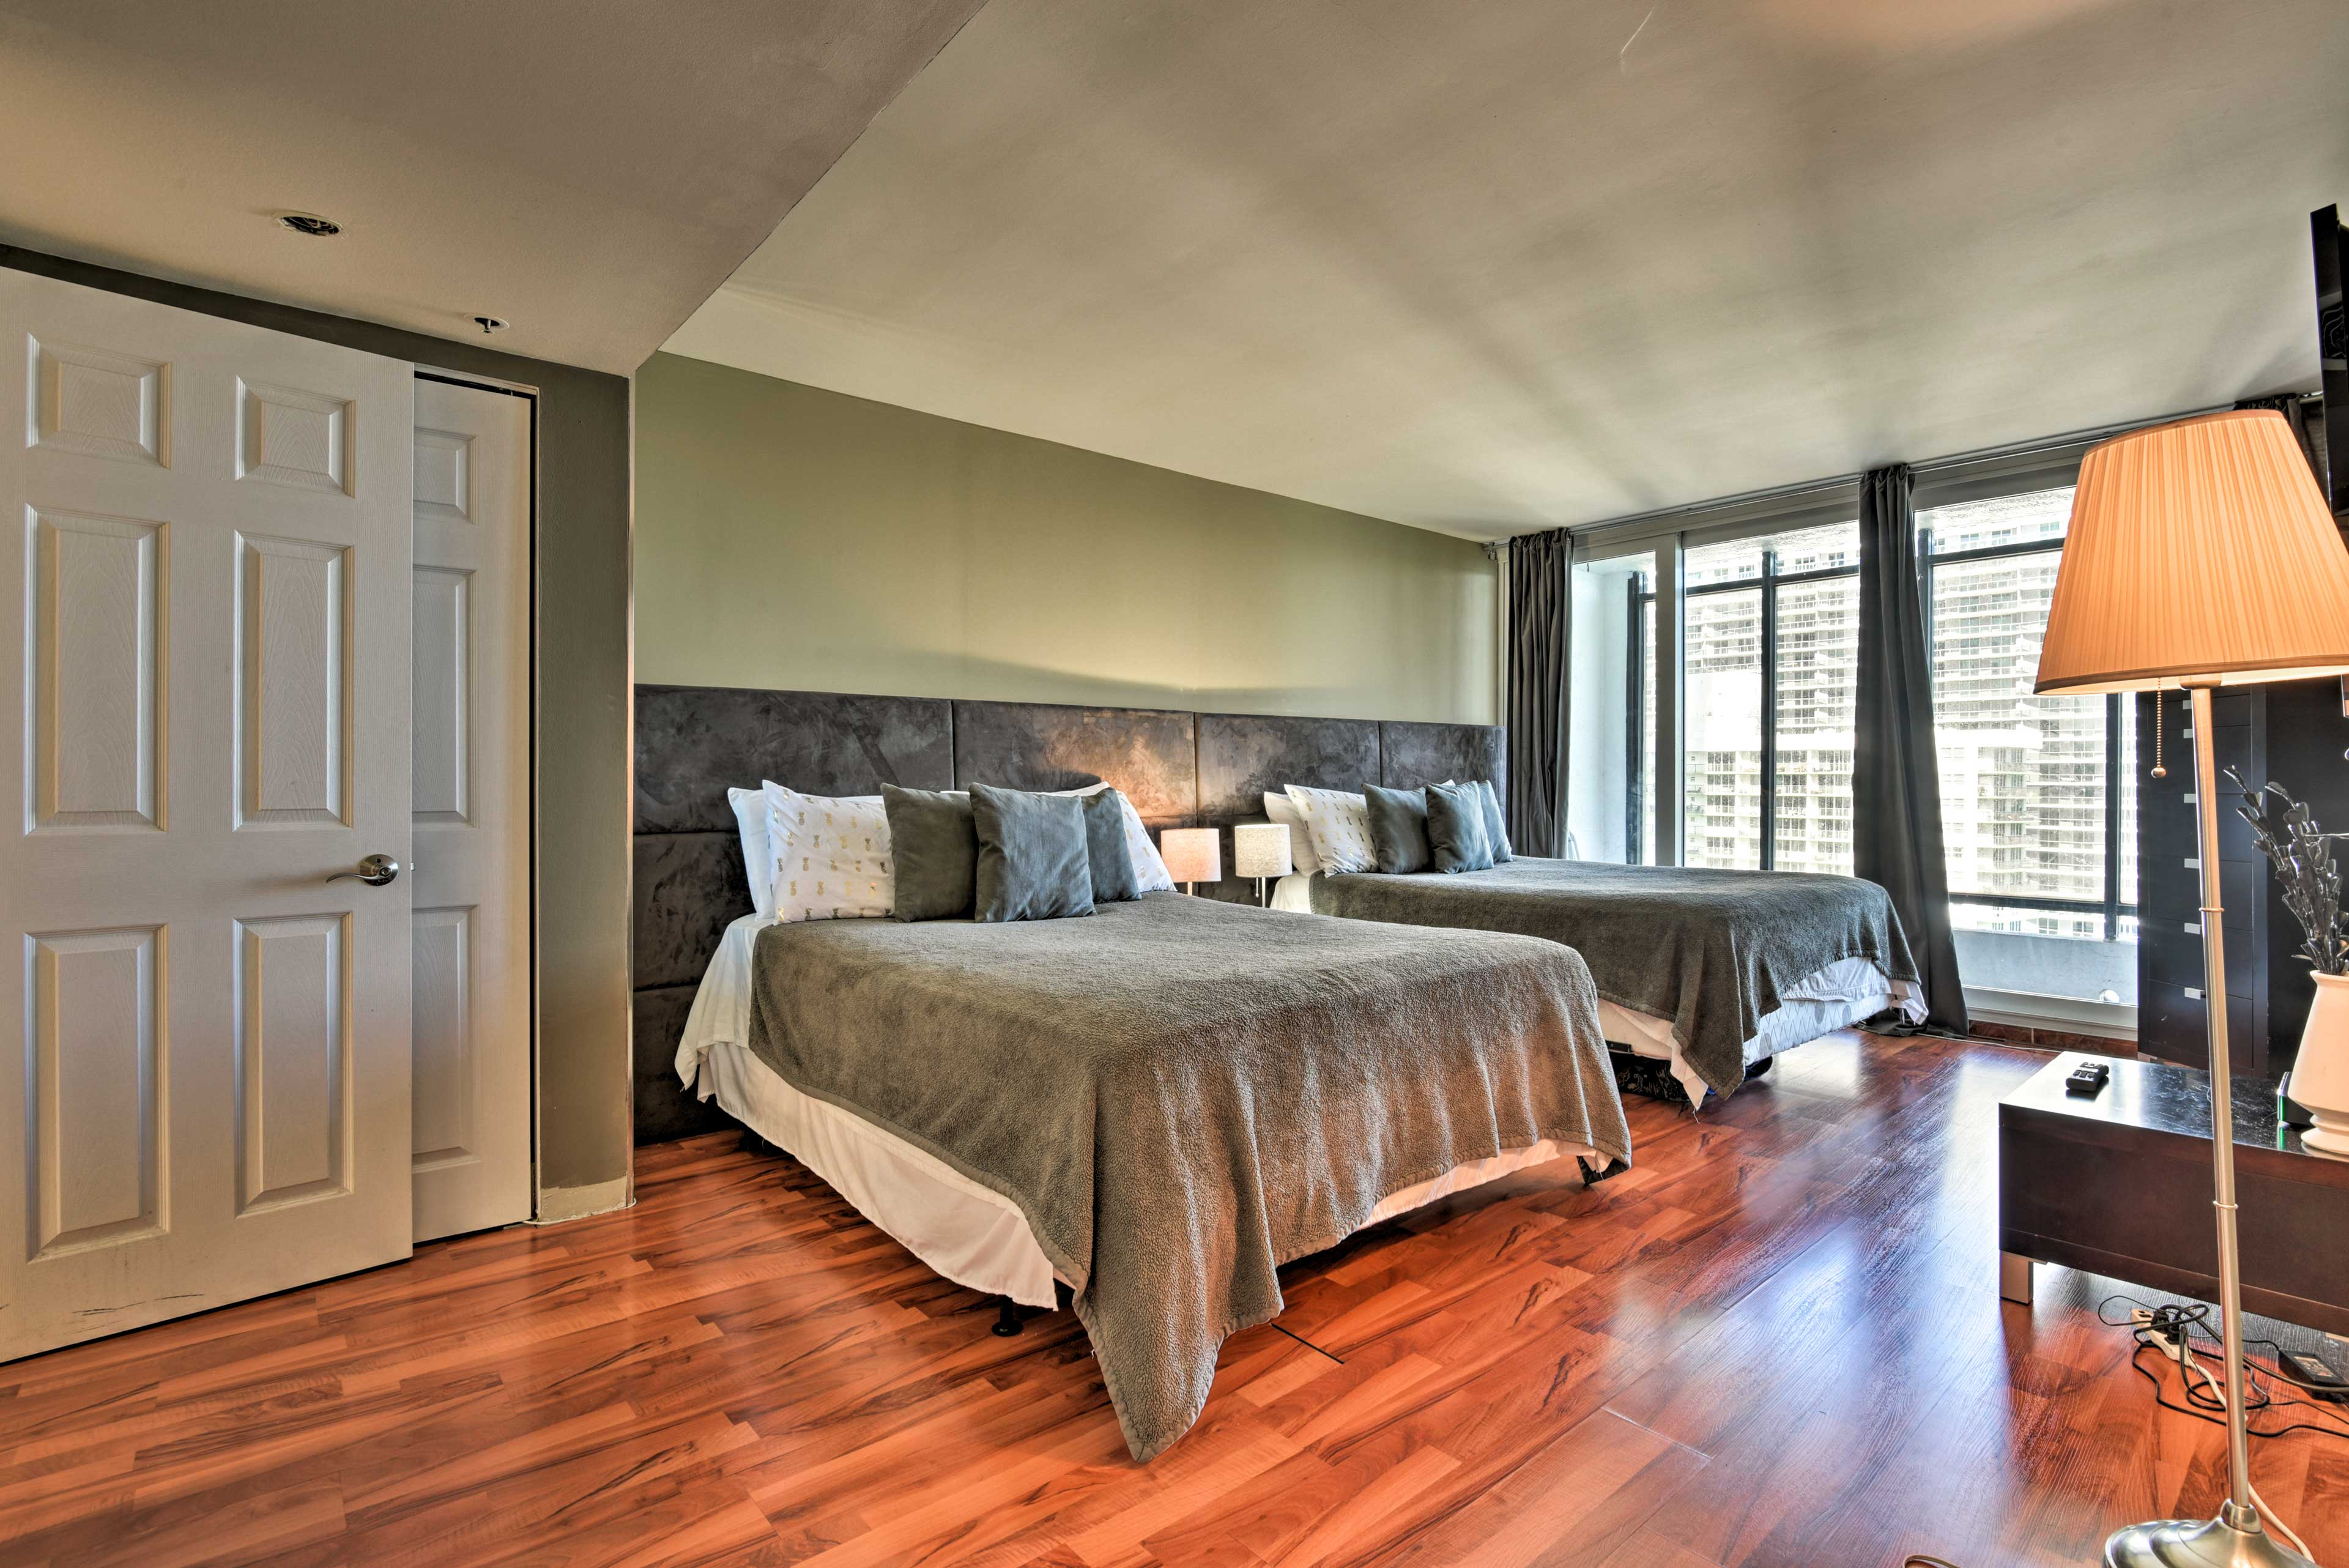 The first bedroom boasts 2 queen mattresses.